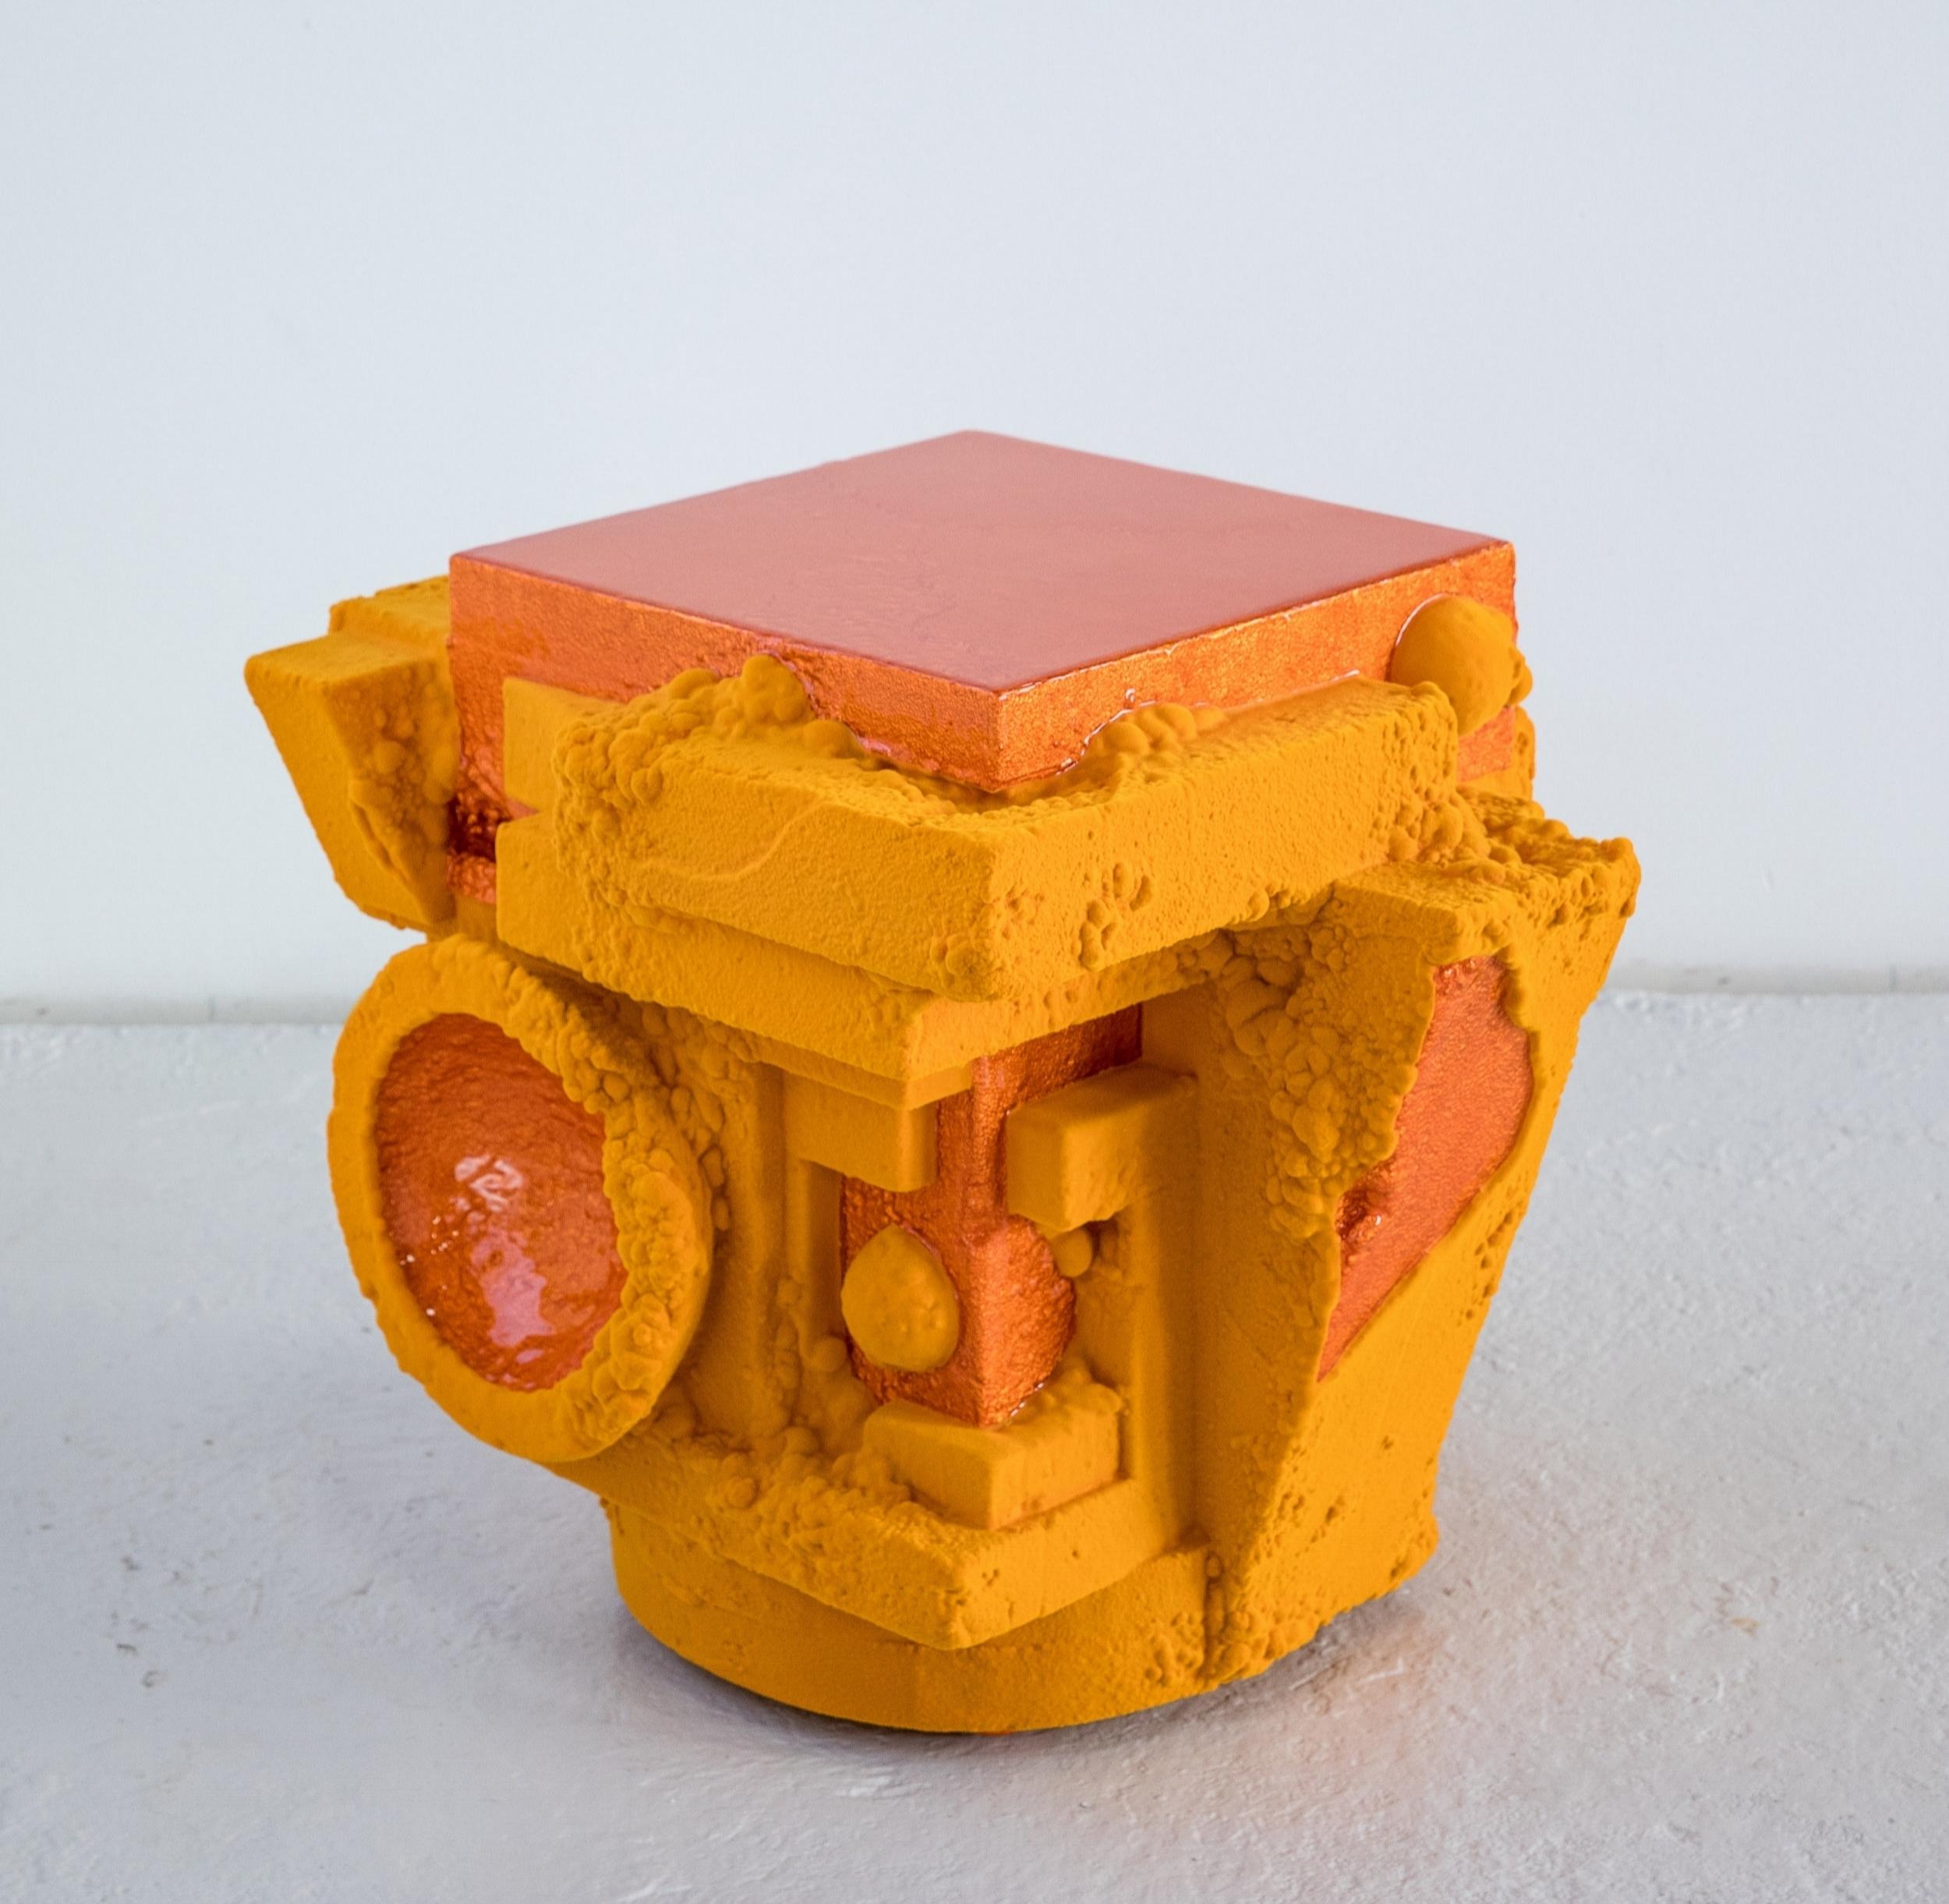 Decobot , 2018 47 x 41 x 8 inches Wood, polystyrene, resin, and nylon fiber